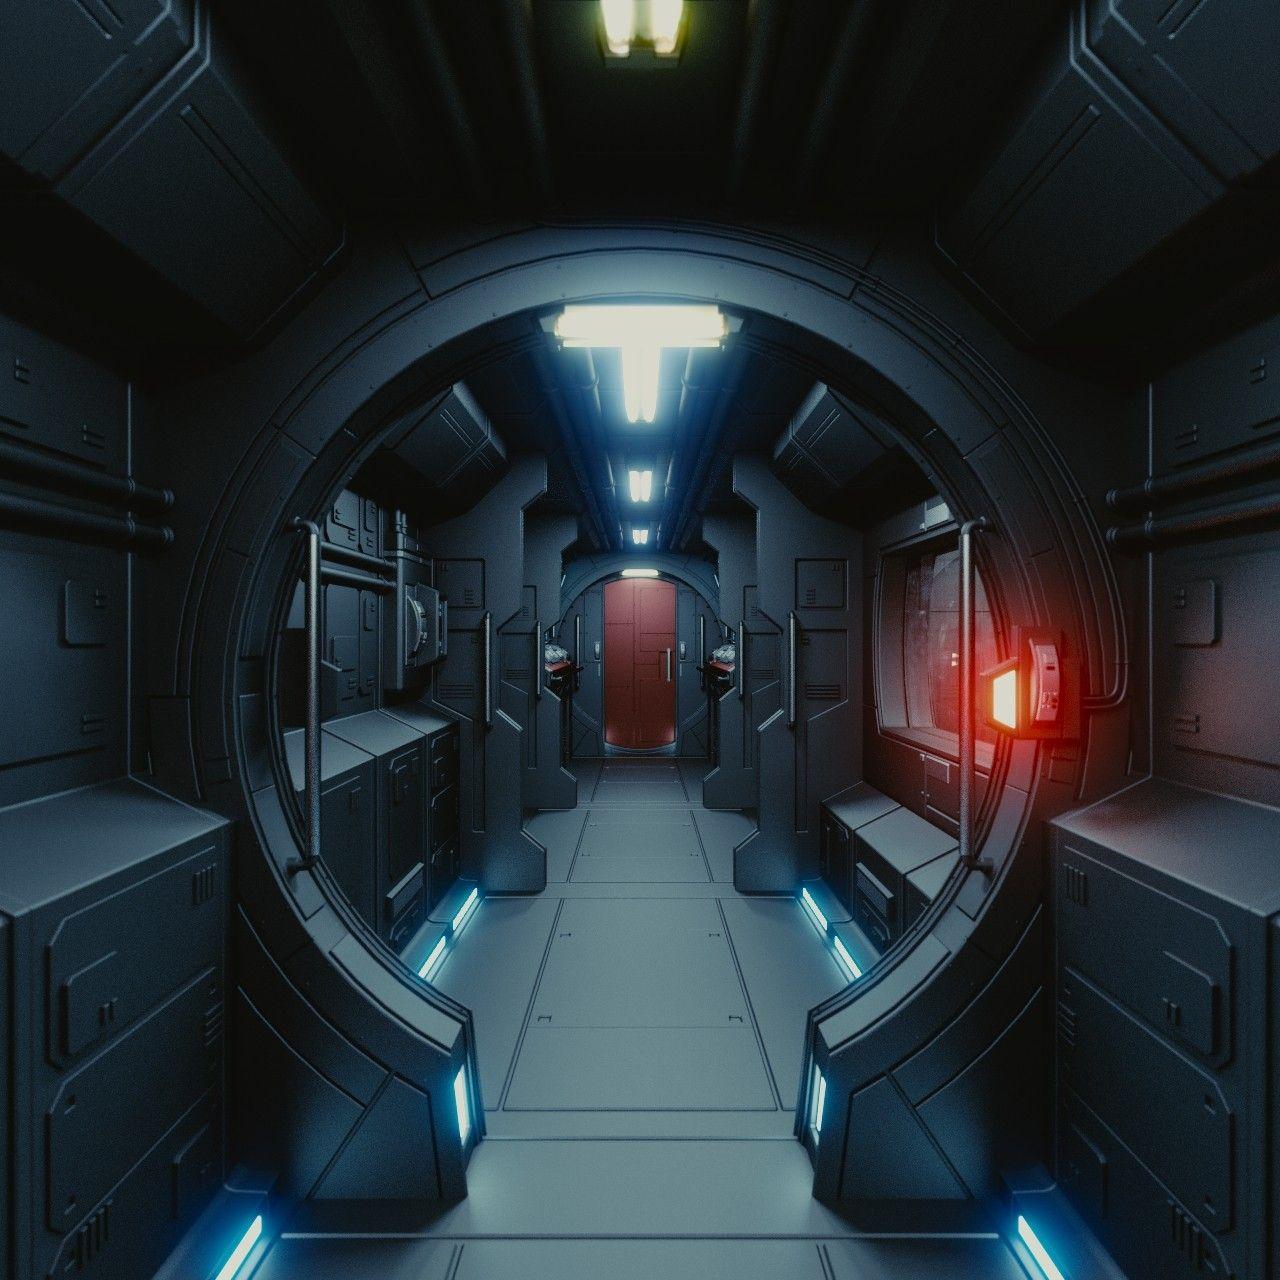 3dsmax Interior Spaceship Space Station In 2019